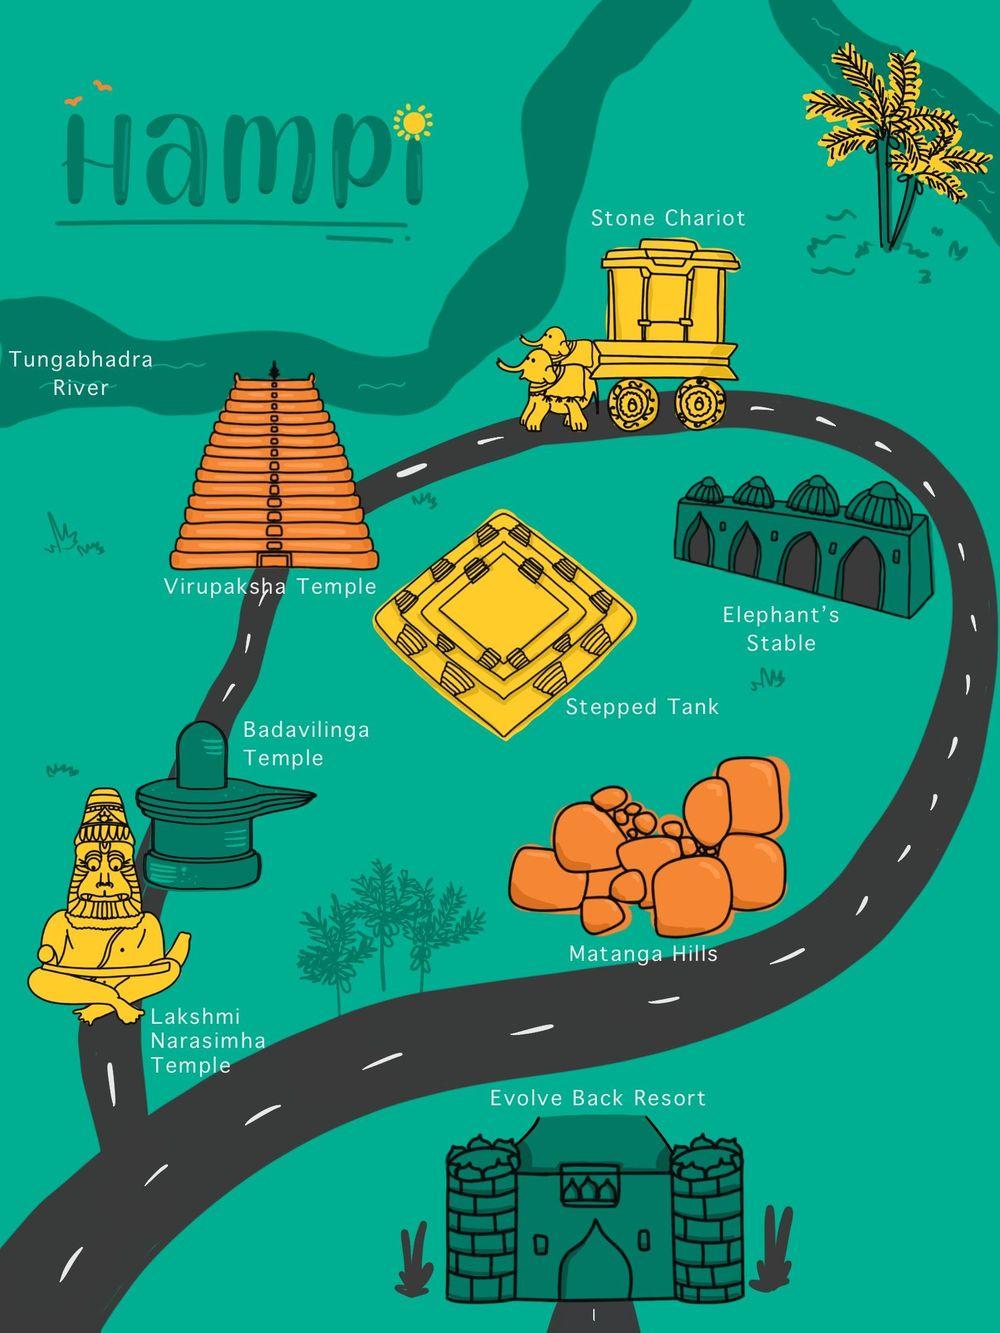 Hampi India - image 1 - student project